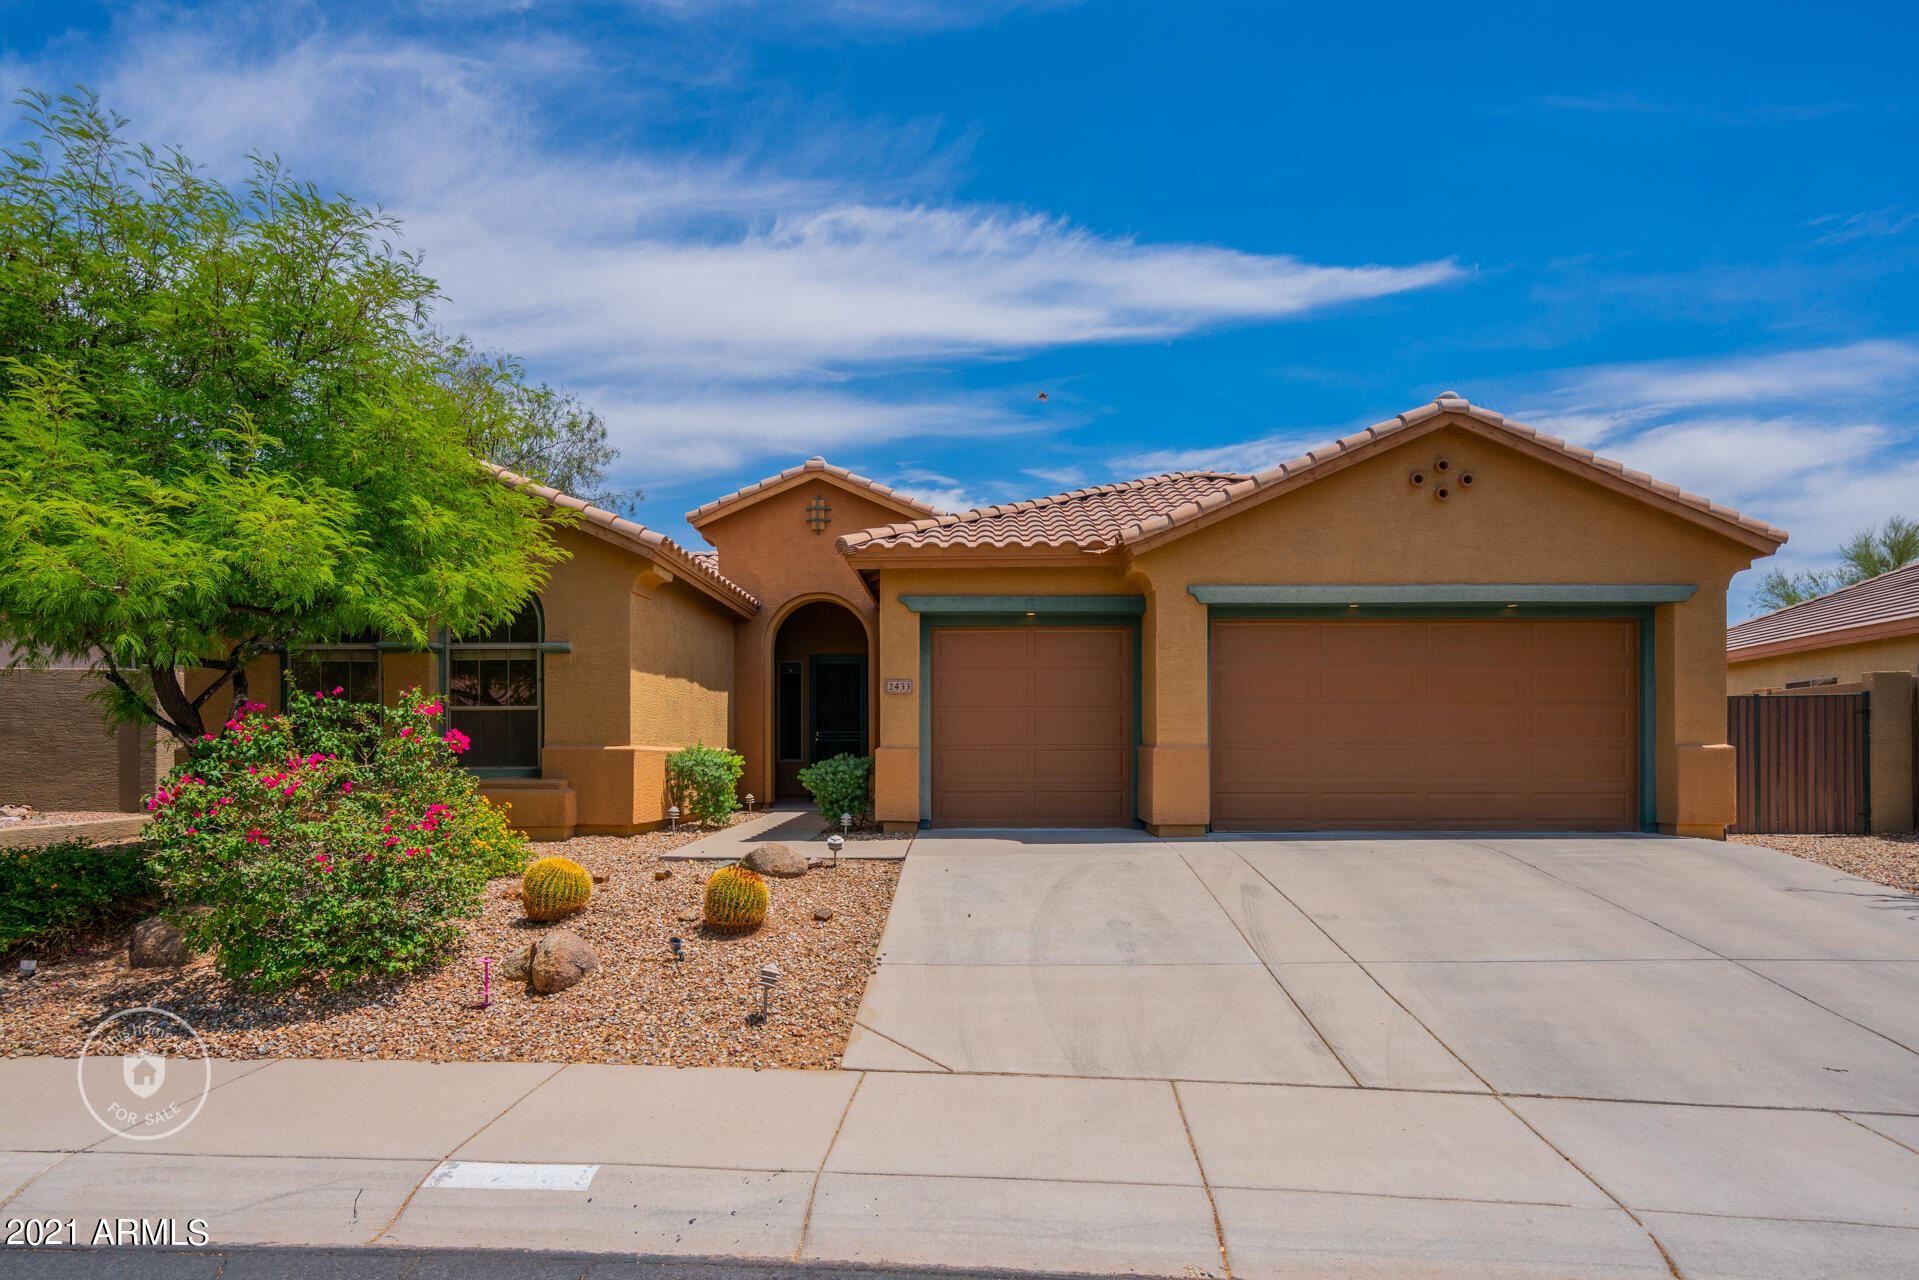 2433 W KIT CARSON Court, Phoenix, AZ 85086 - MLS#: 6245019